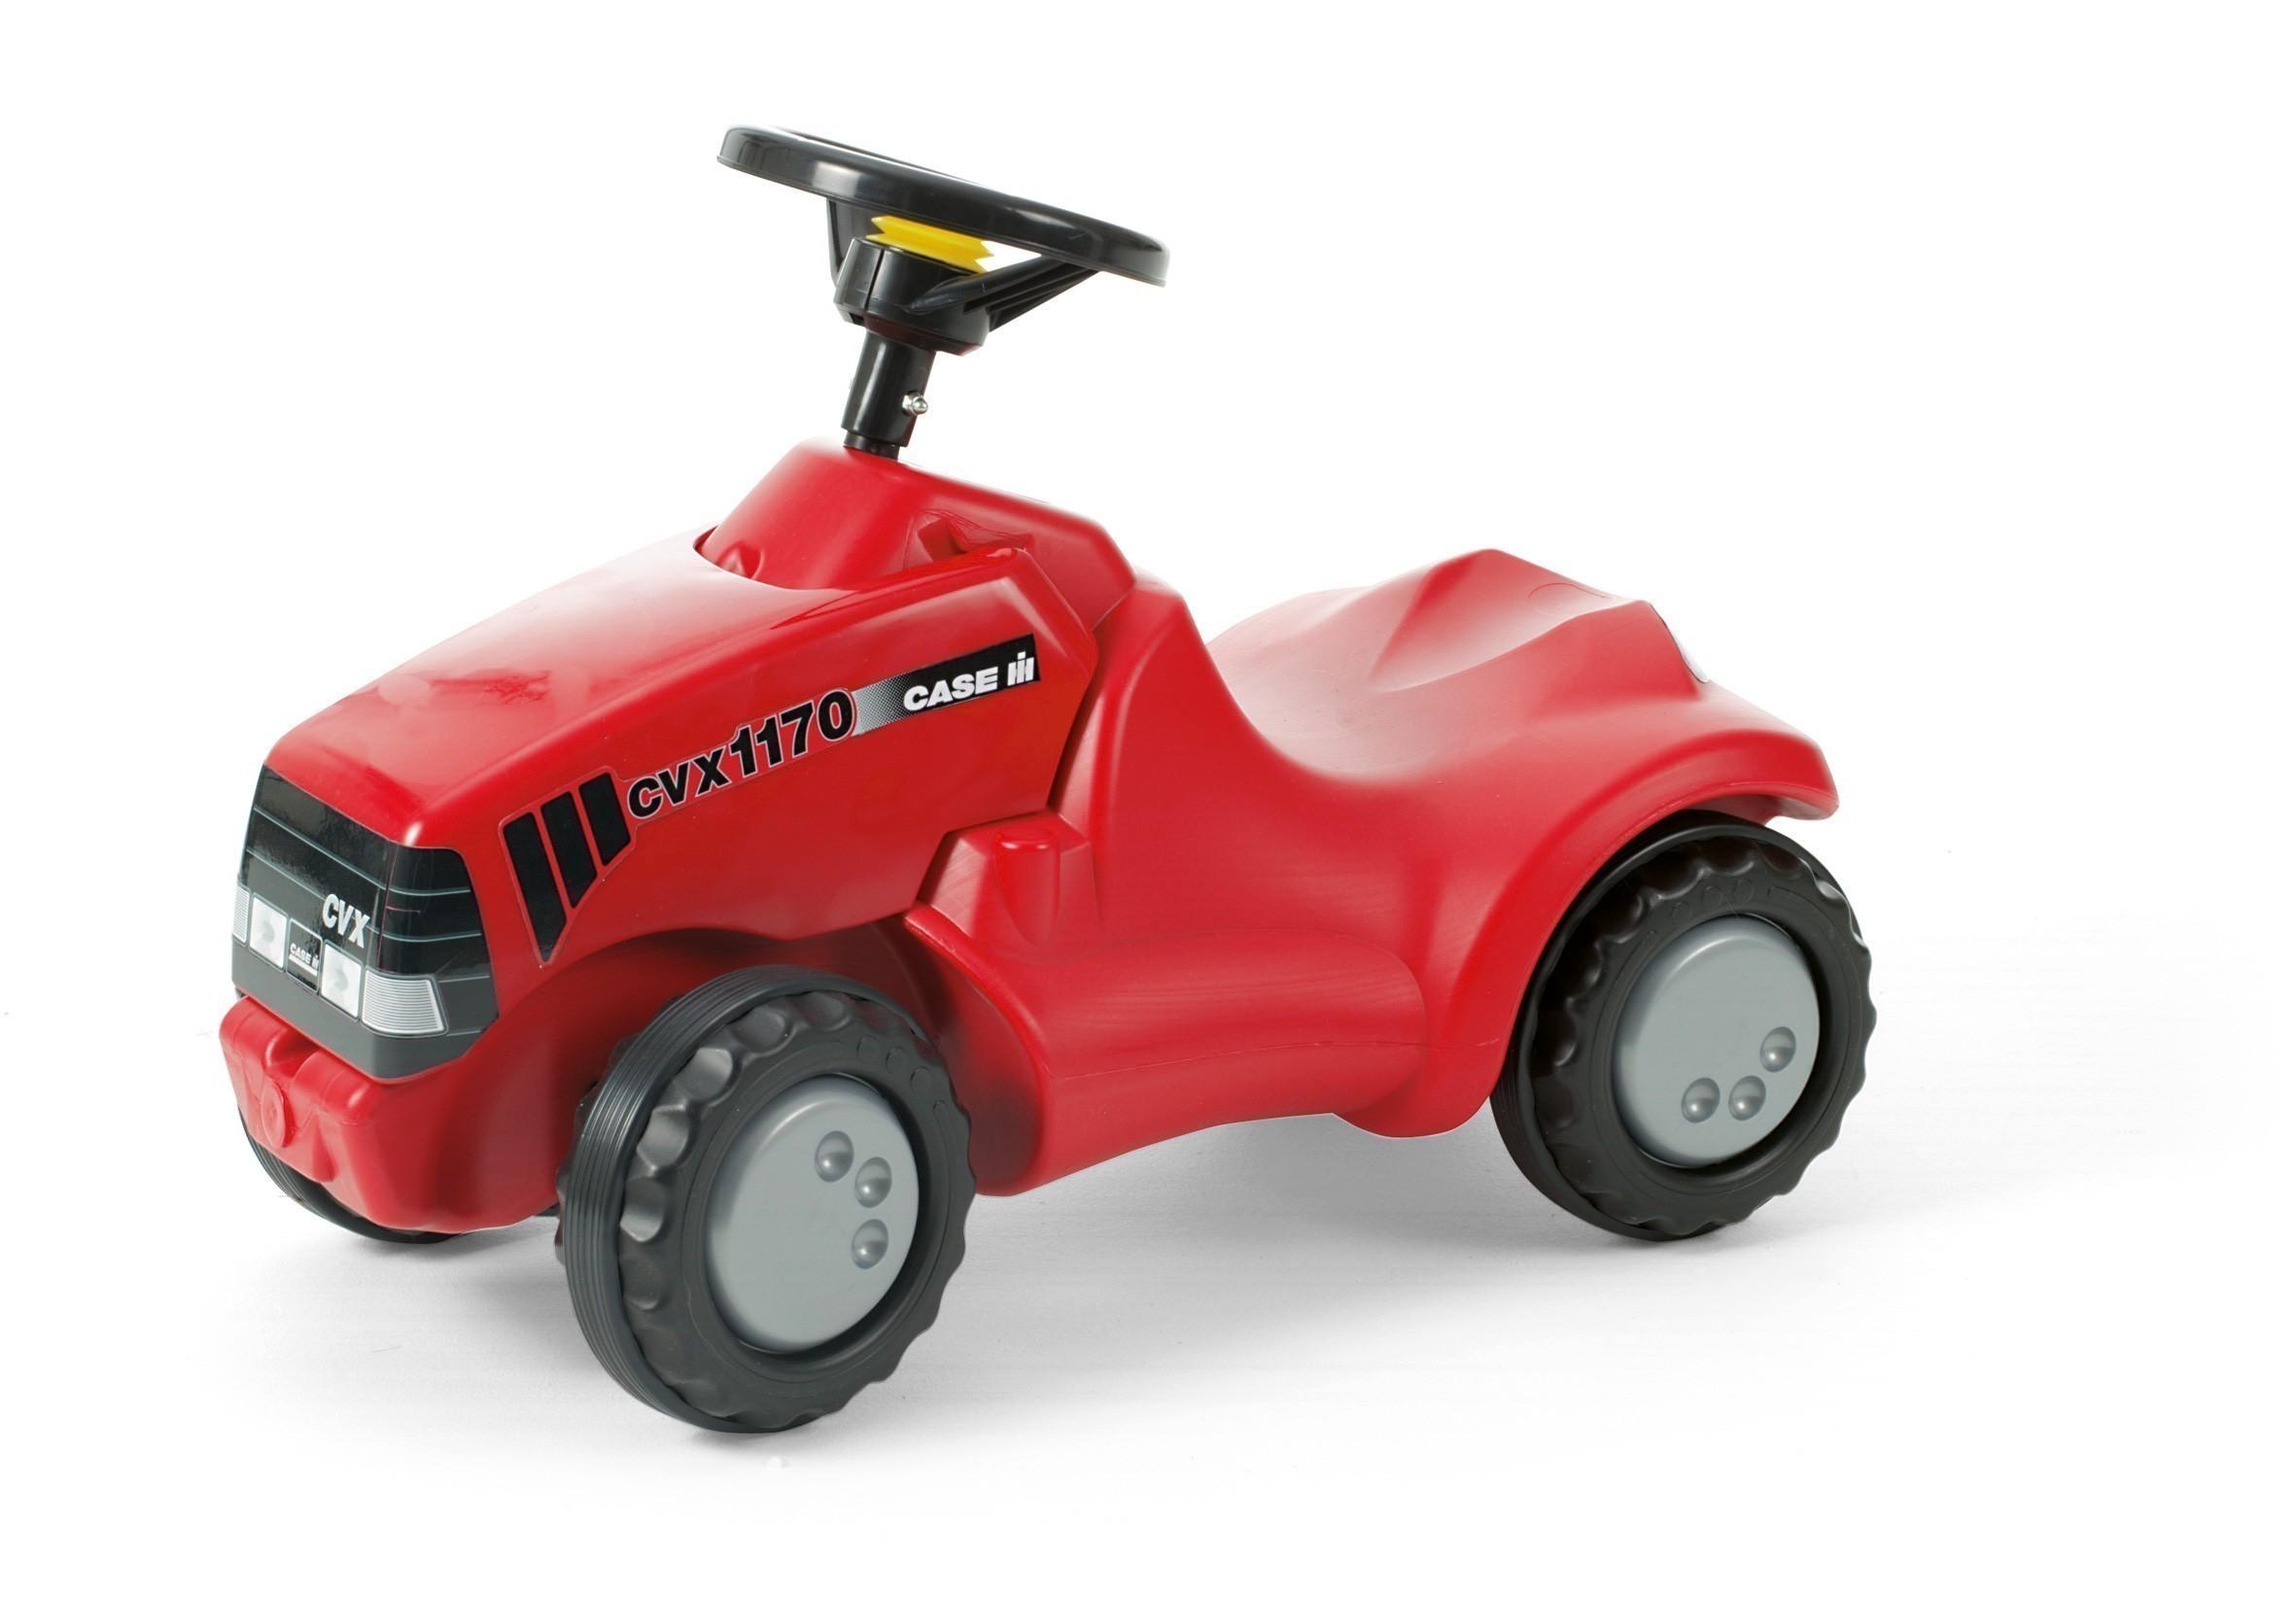 Rutscher rolly Minitrac Case CVX 1170 - Rolly Toys Bild 1